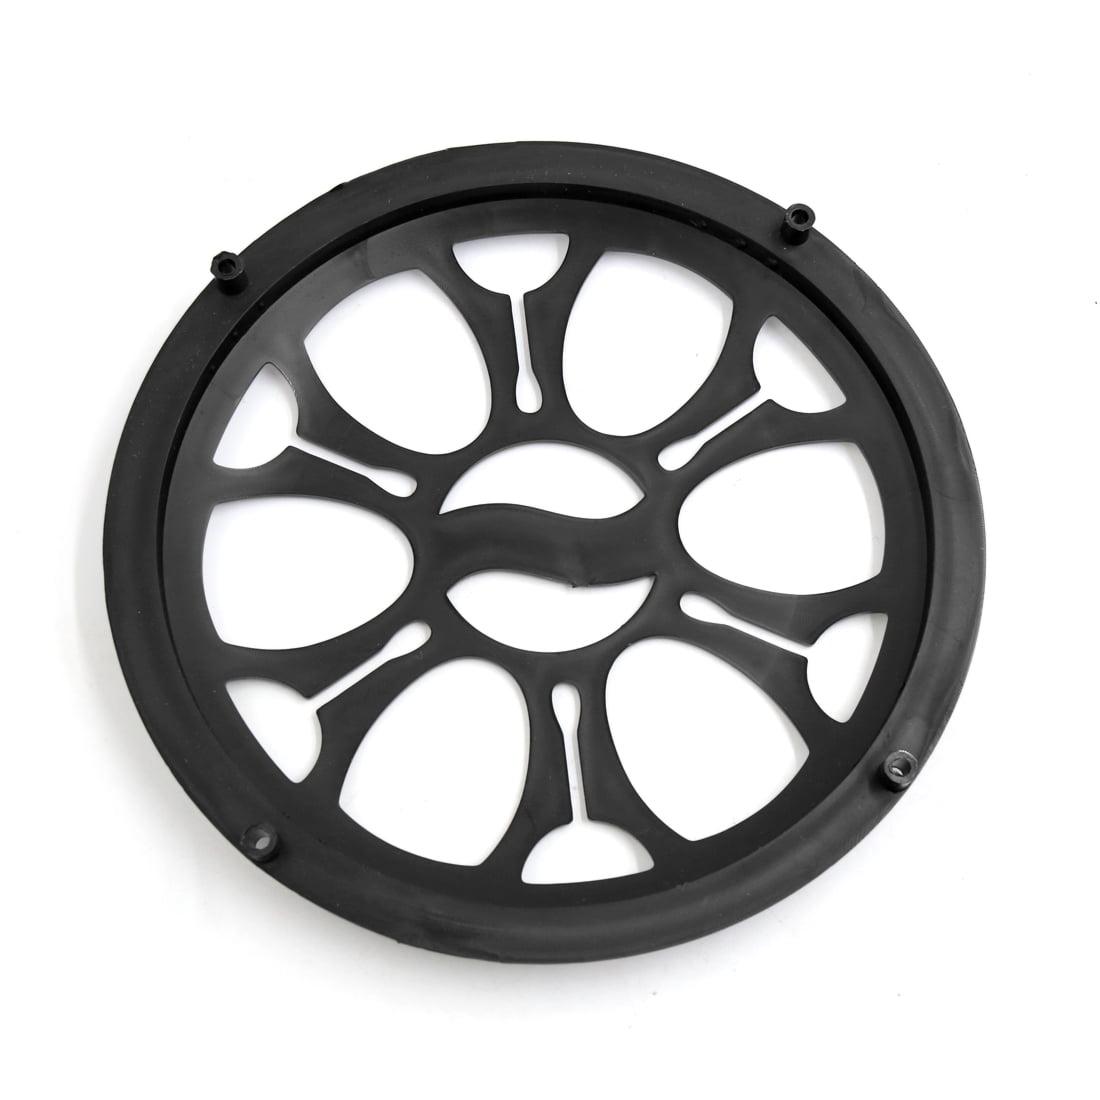 "4pcs 8"" Black Plastic Car Audio Woofer Subwoofer Mesh"